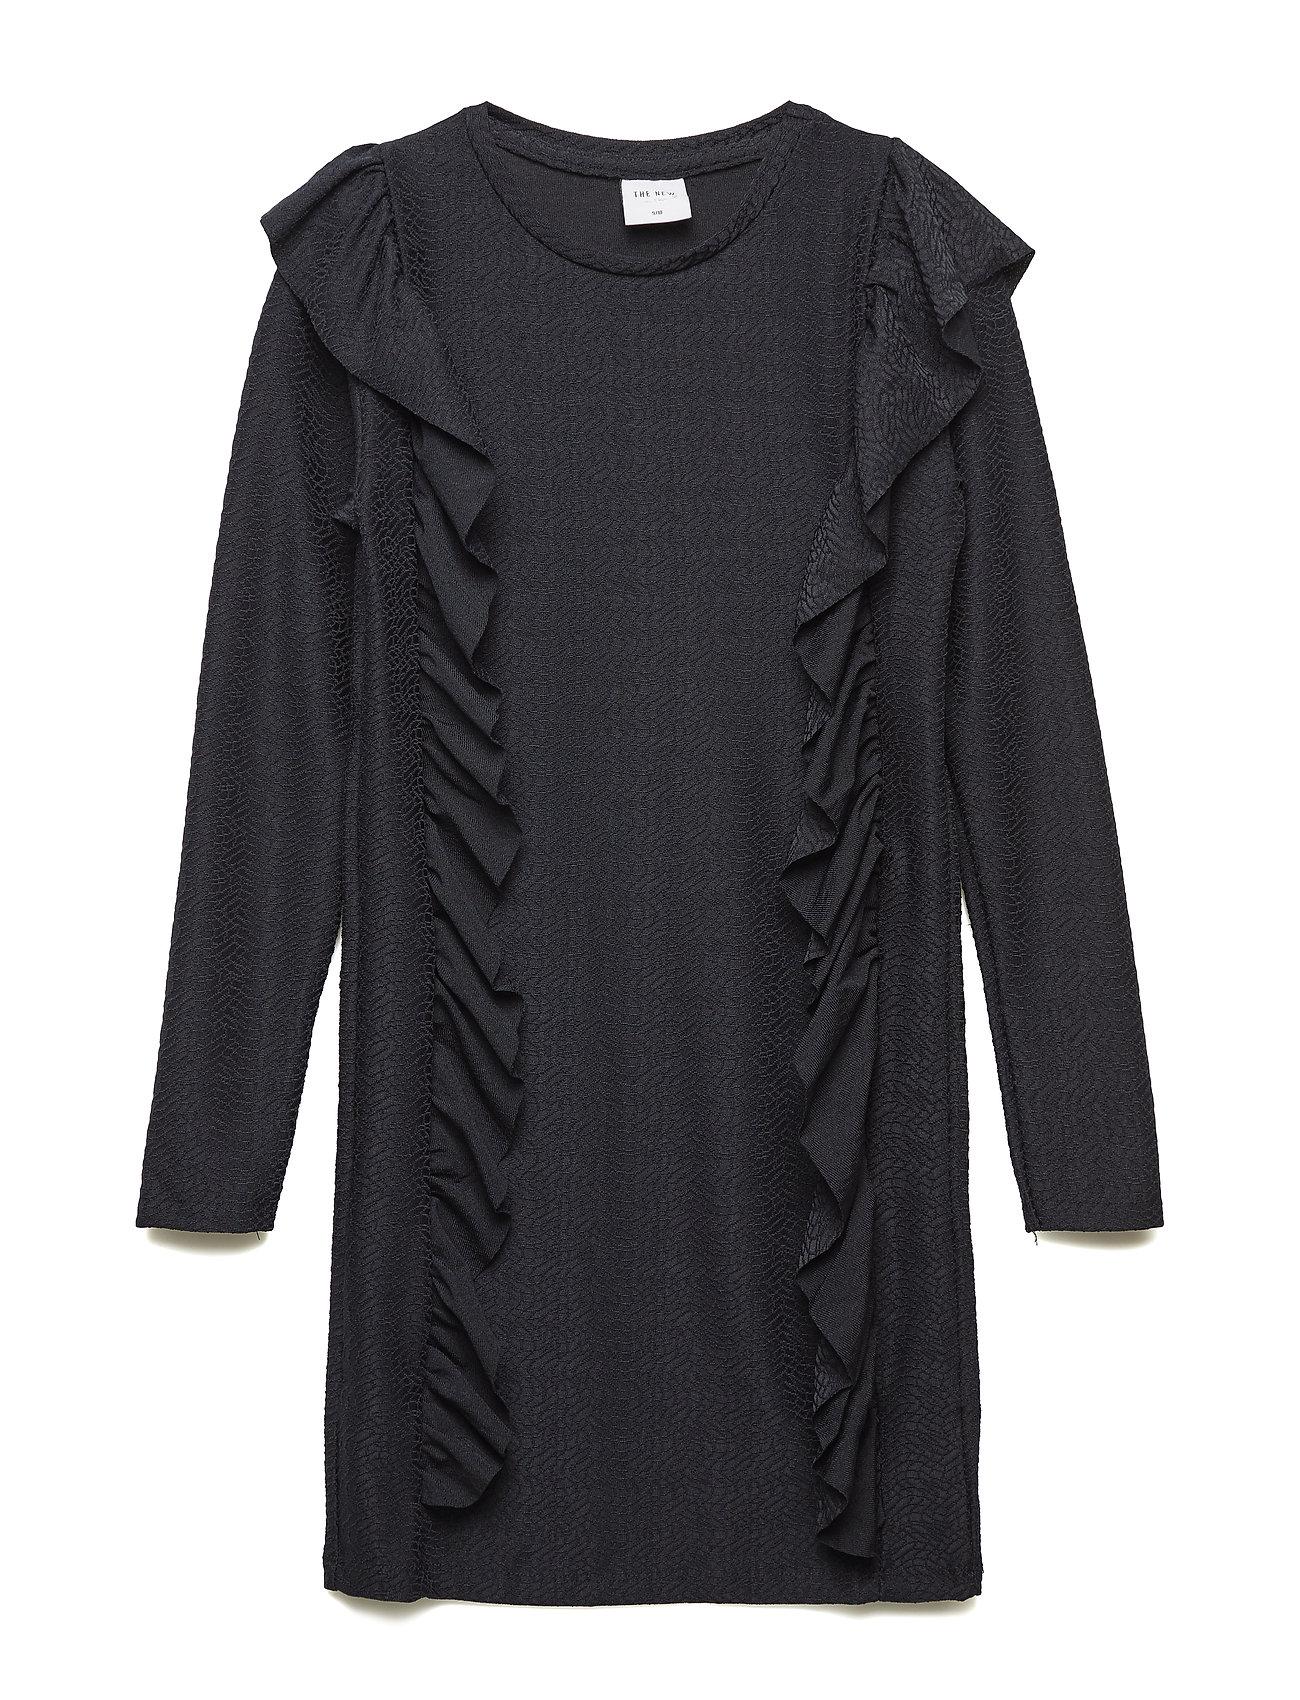 Image of Ida L_s Dress Kjole Sort THE NEW (3072759609)